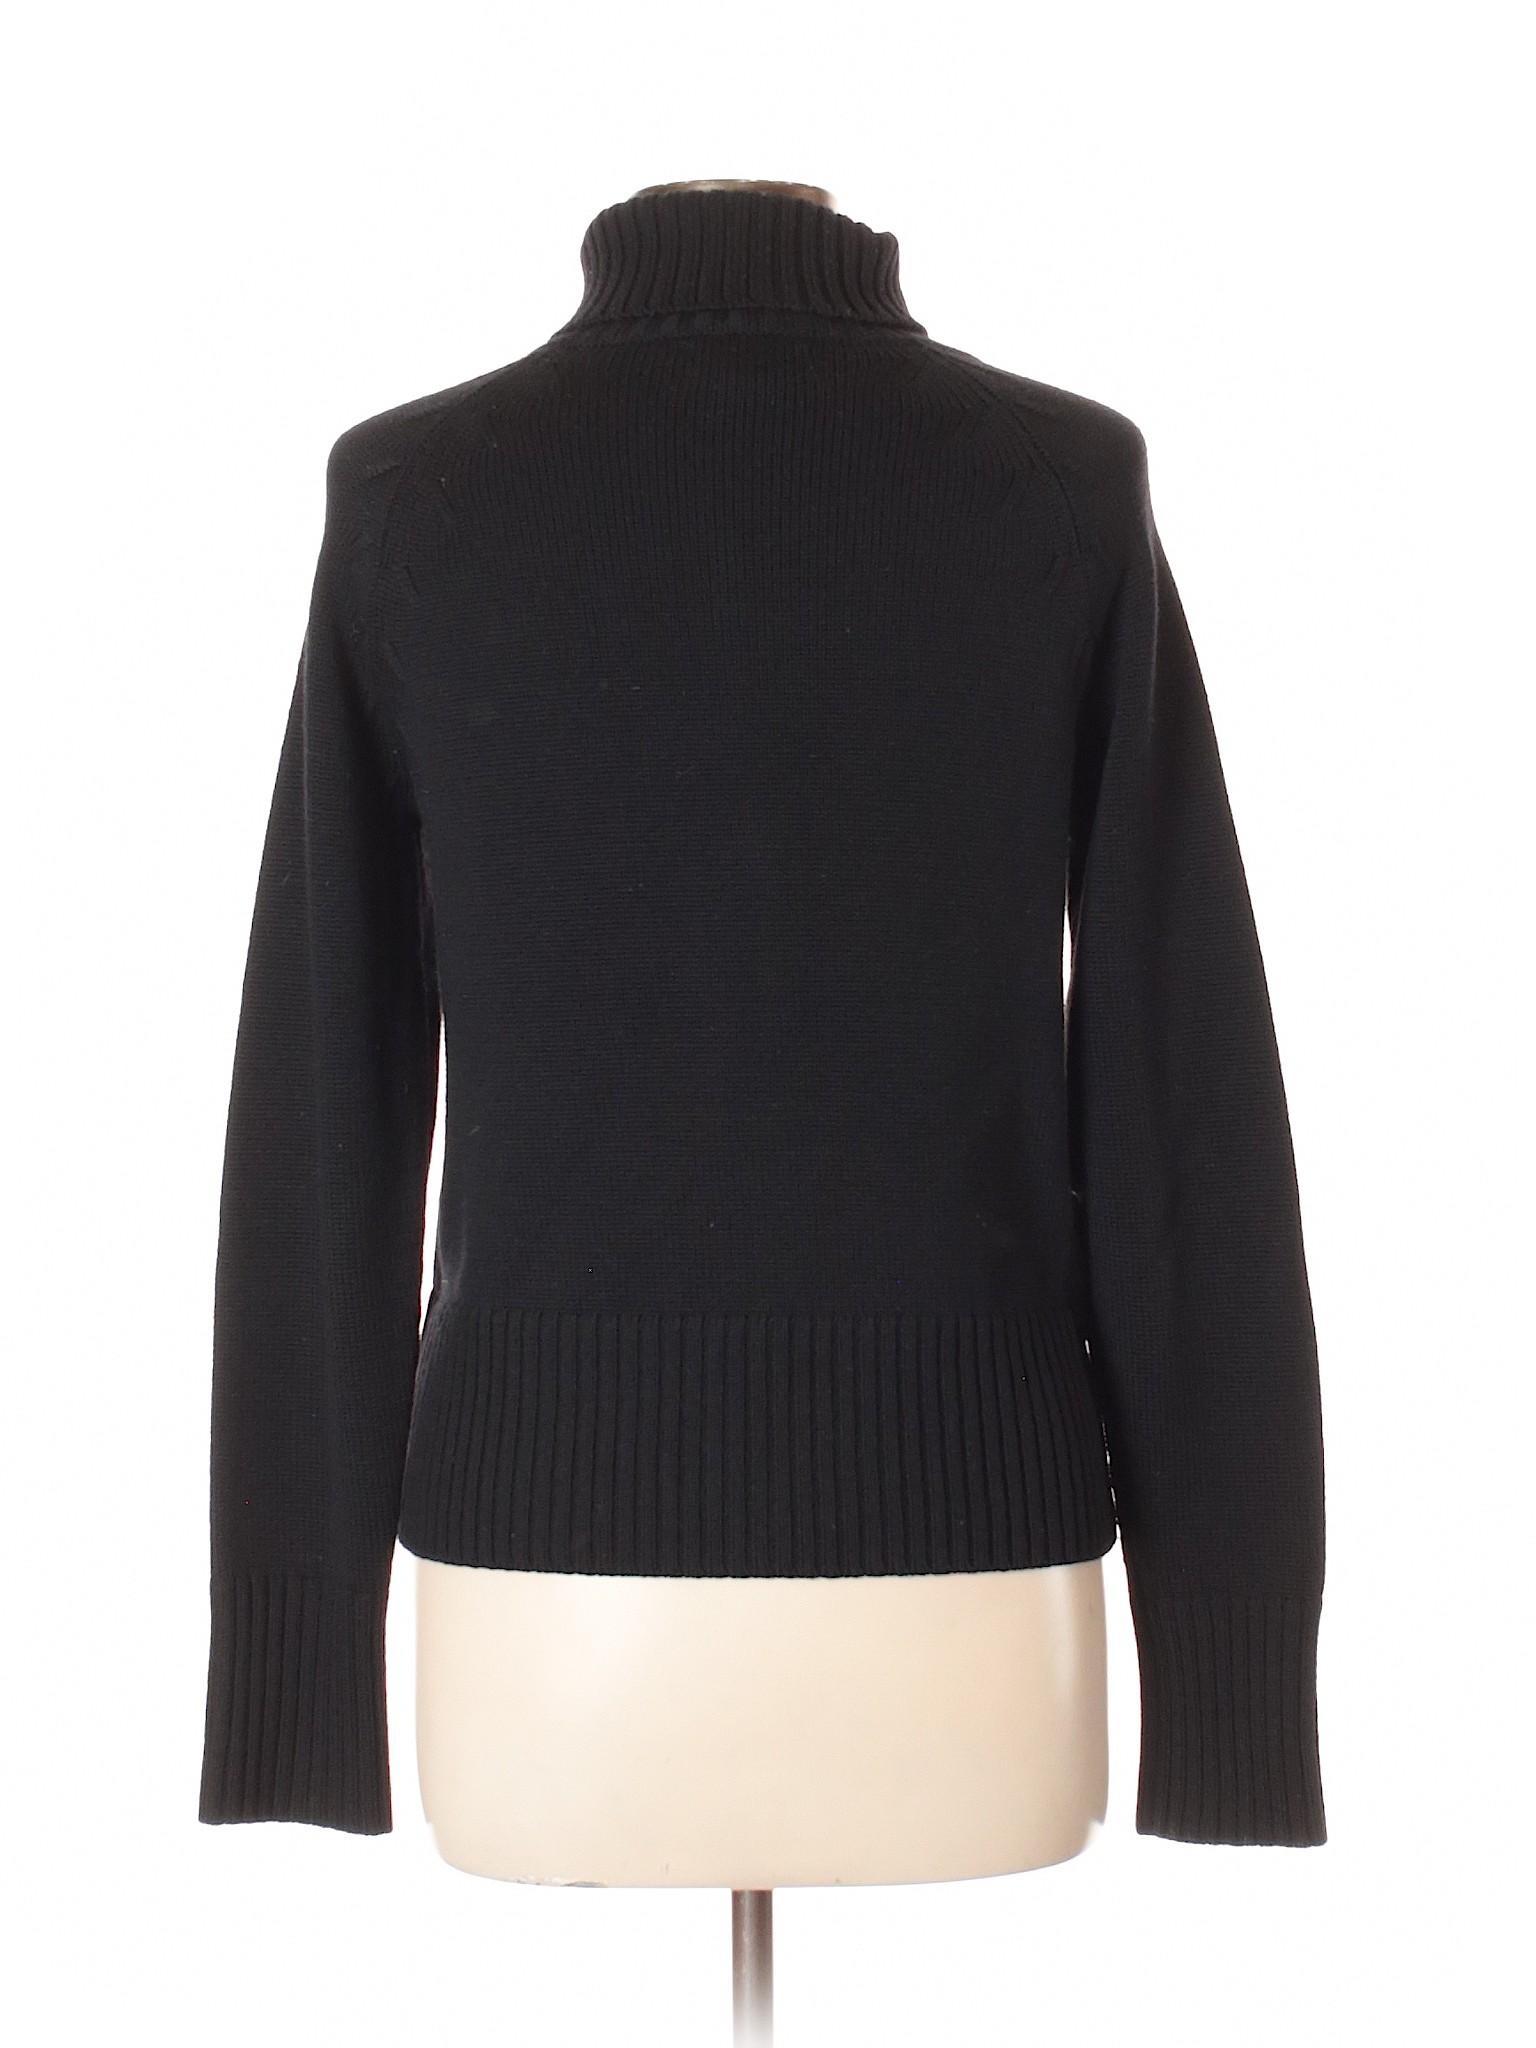 winter Sweater Pullover Banana Wool Factory Store Republic Boutique zdaxZwfa